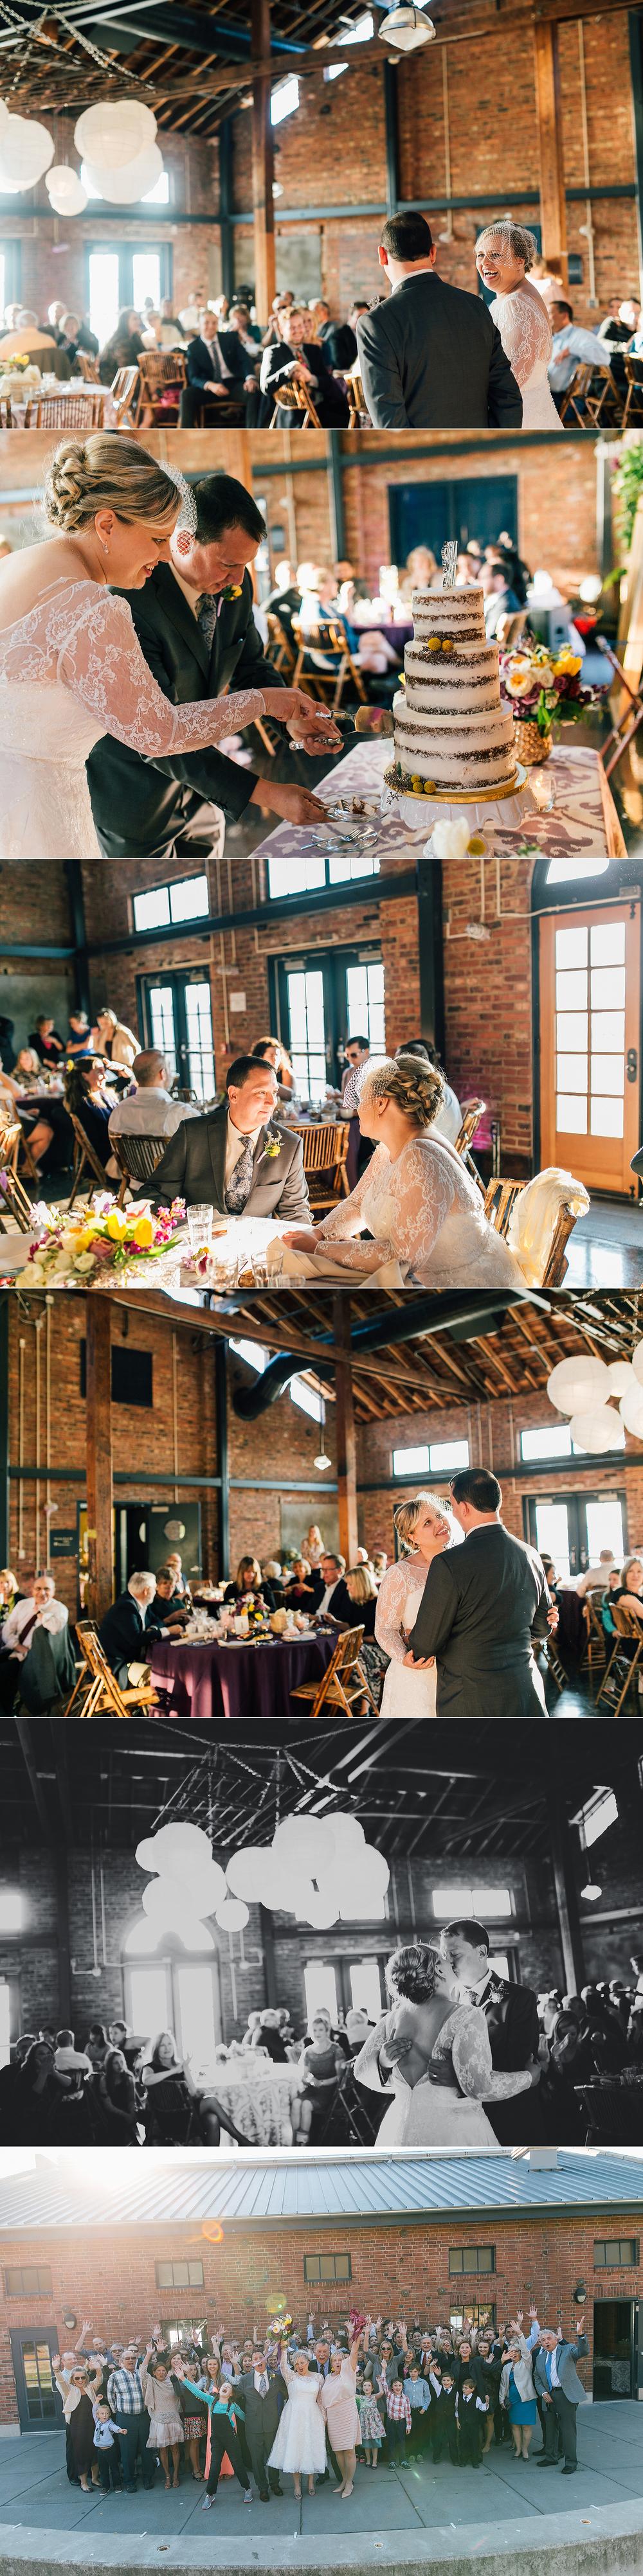 ashley vos photography seattle area wedding photographer_0835.jpg